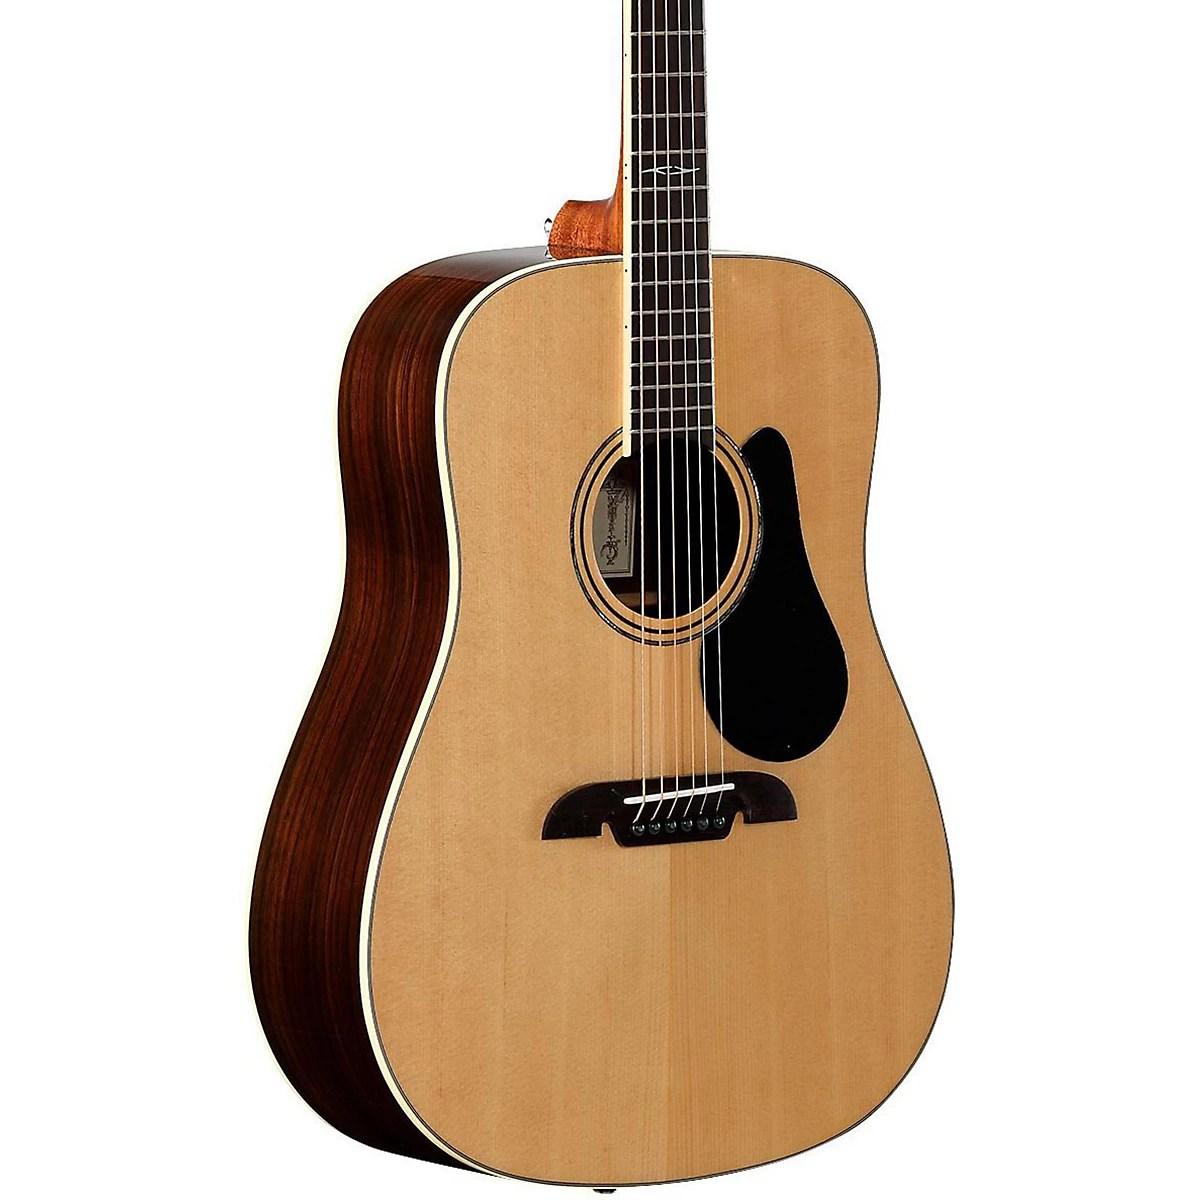 Alvarez Artist Series AD70 Dreadnought Guitar   Guitar Center